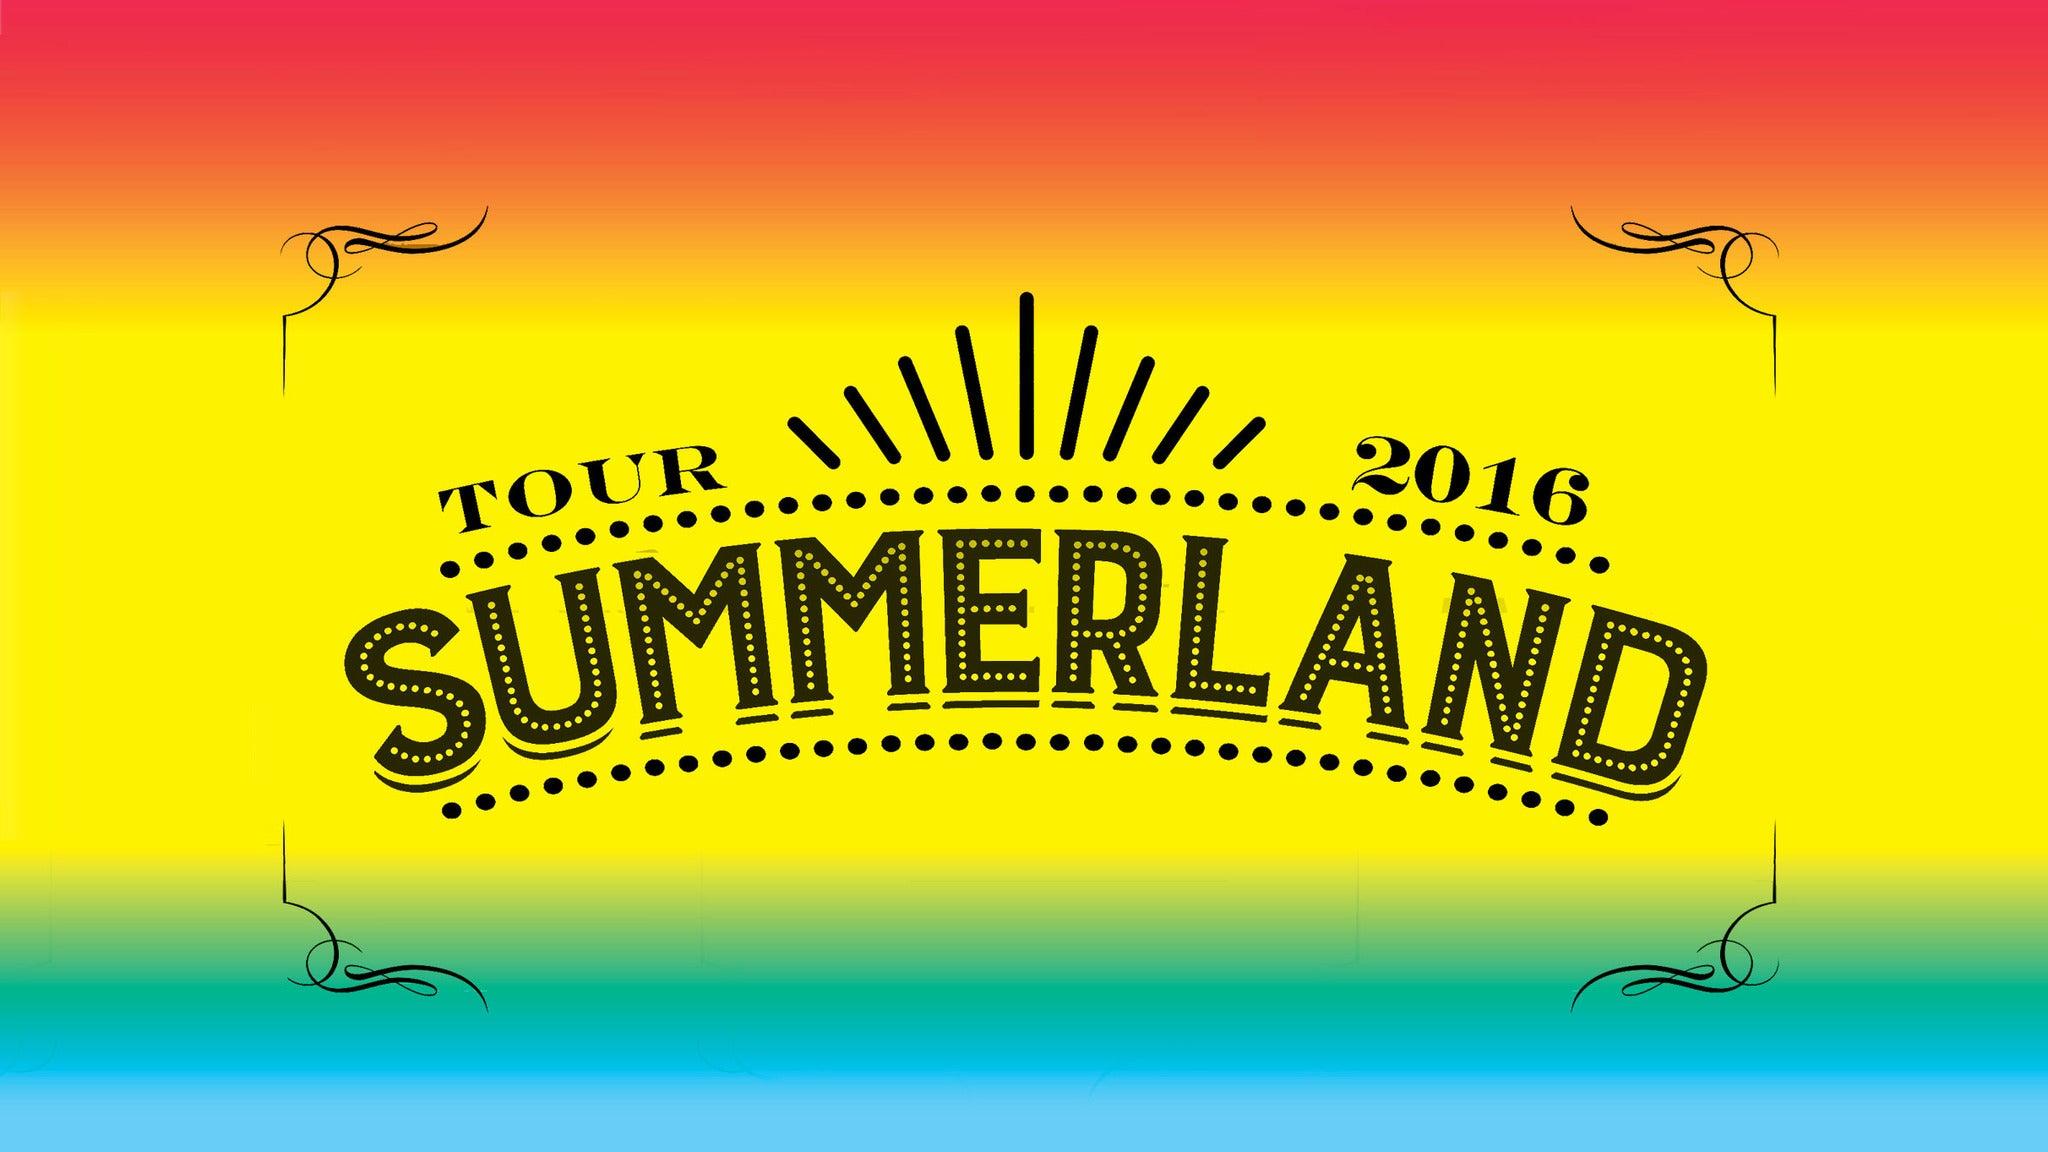 Summerland Tour 2016 at Laredo Energy Arena